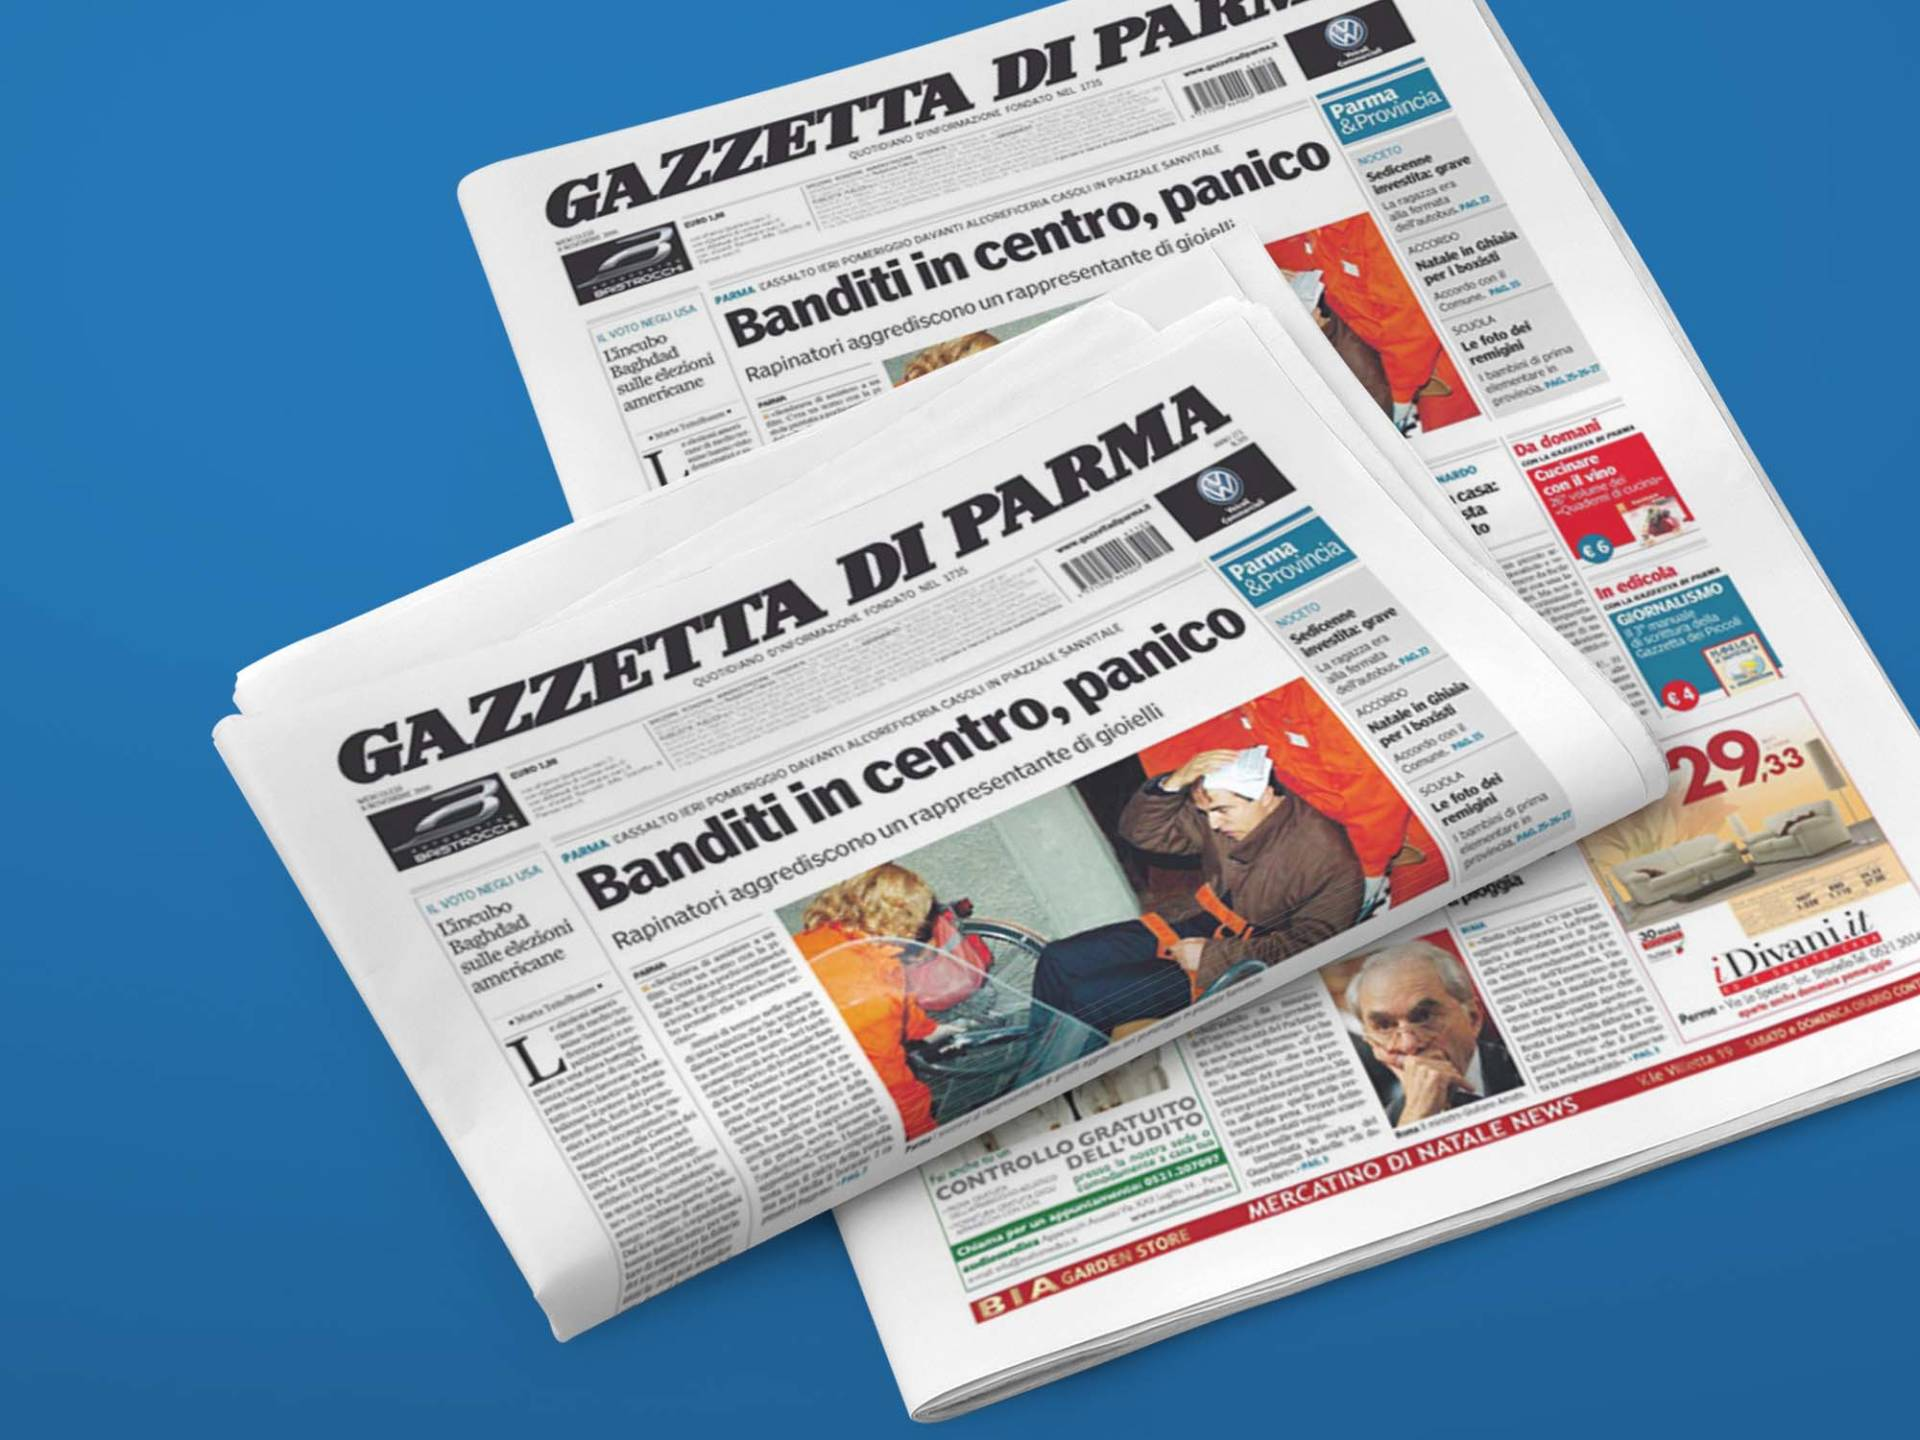 Gazzetta_di_Parma_01_Wenceslau_News_Design